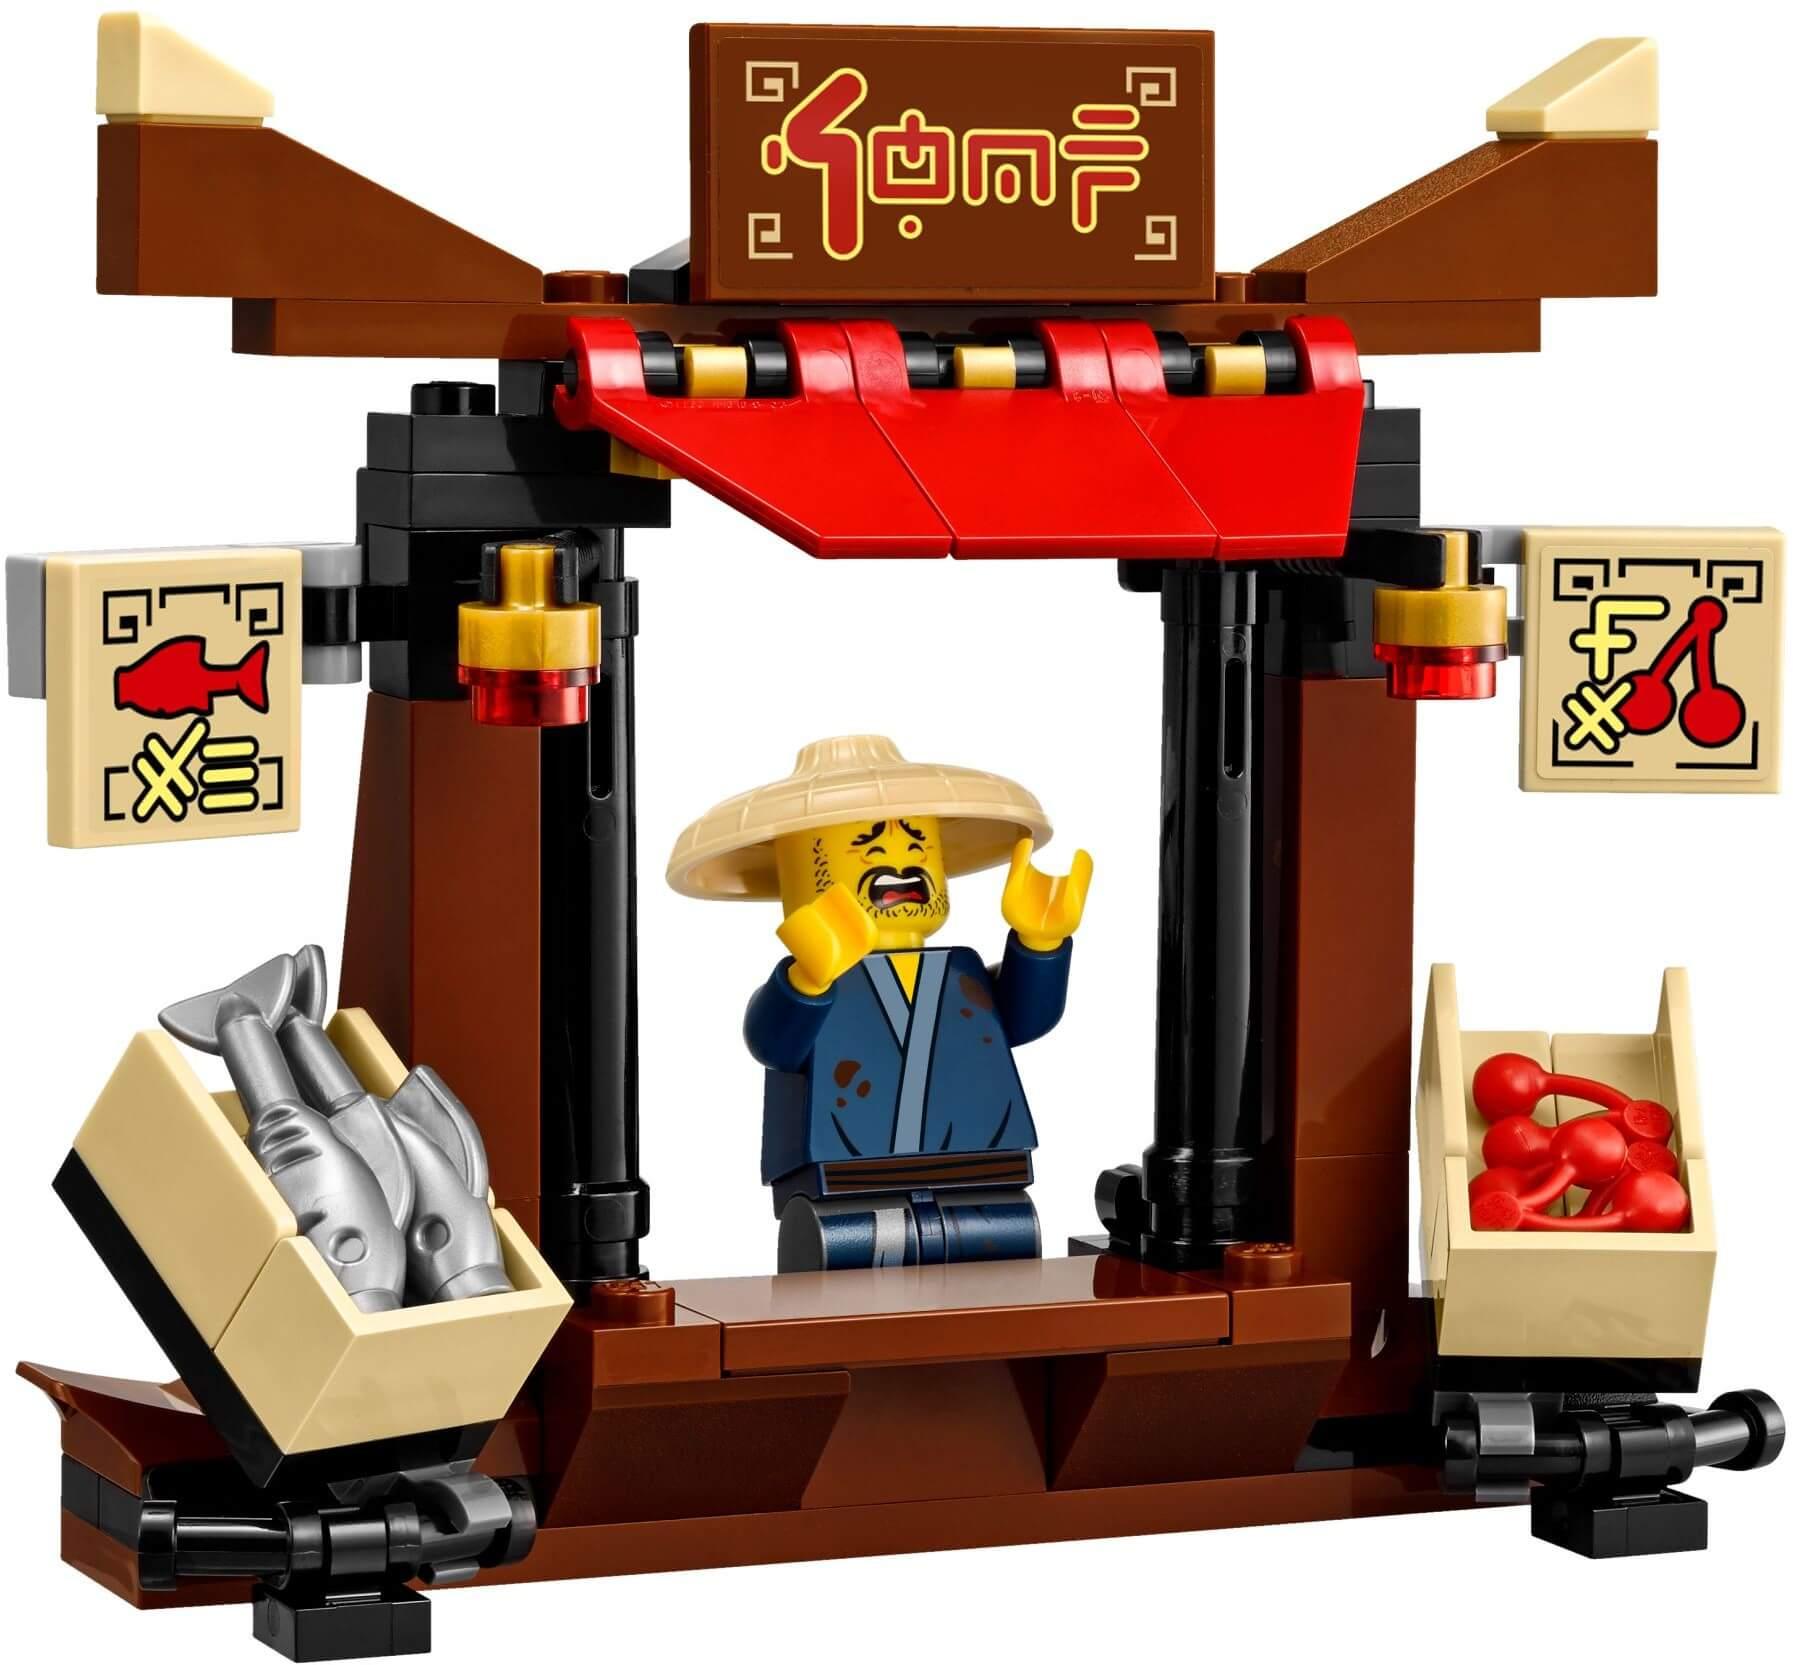 Mua đồ chơi LEGO 70607 - LEGO Ninjago 70607 - Các Ninja Rượt Đuổi Tội Phạm (LEGO Ninjago City Chase)